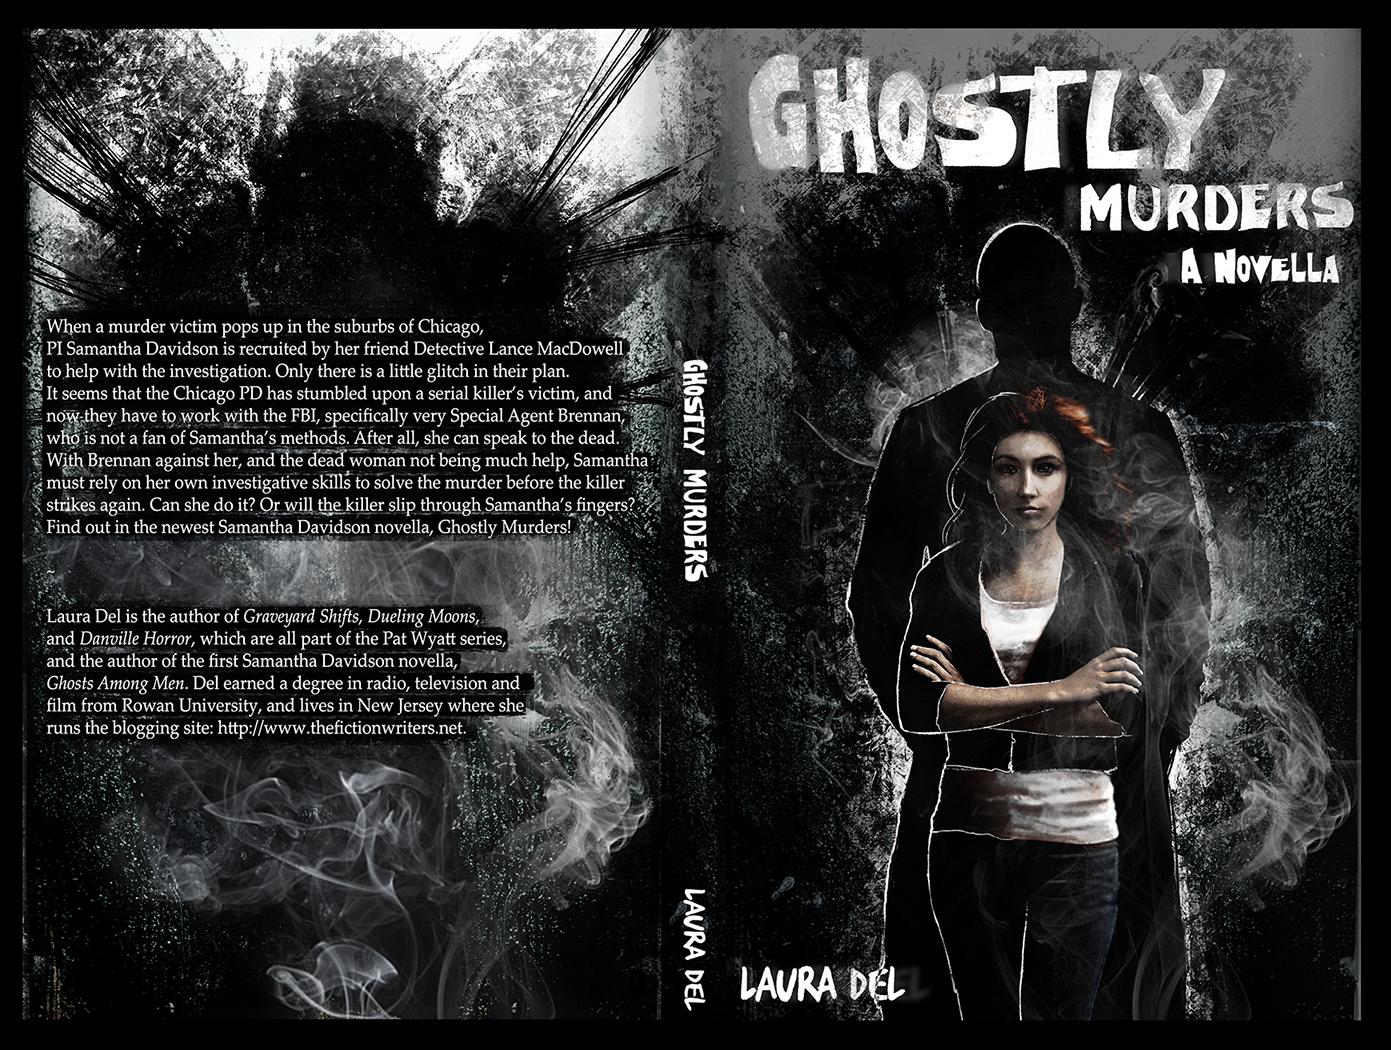 Ghostly Murders